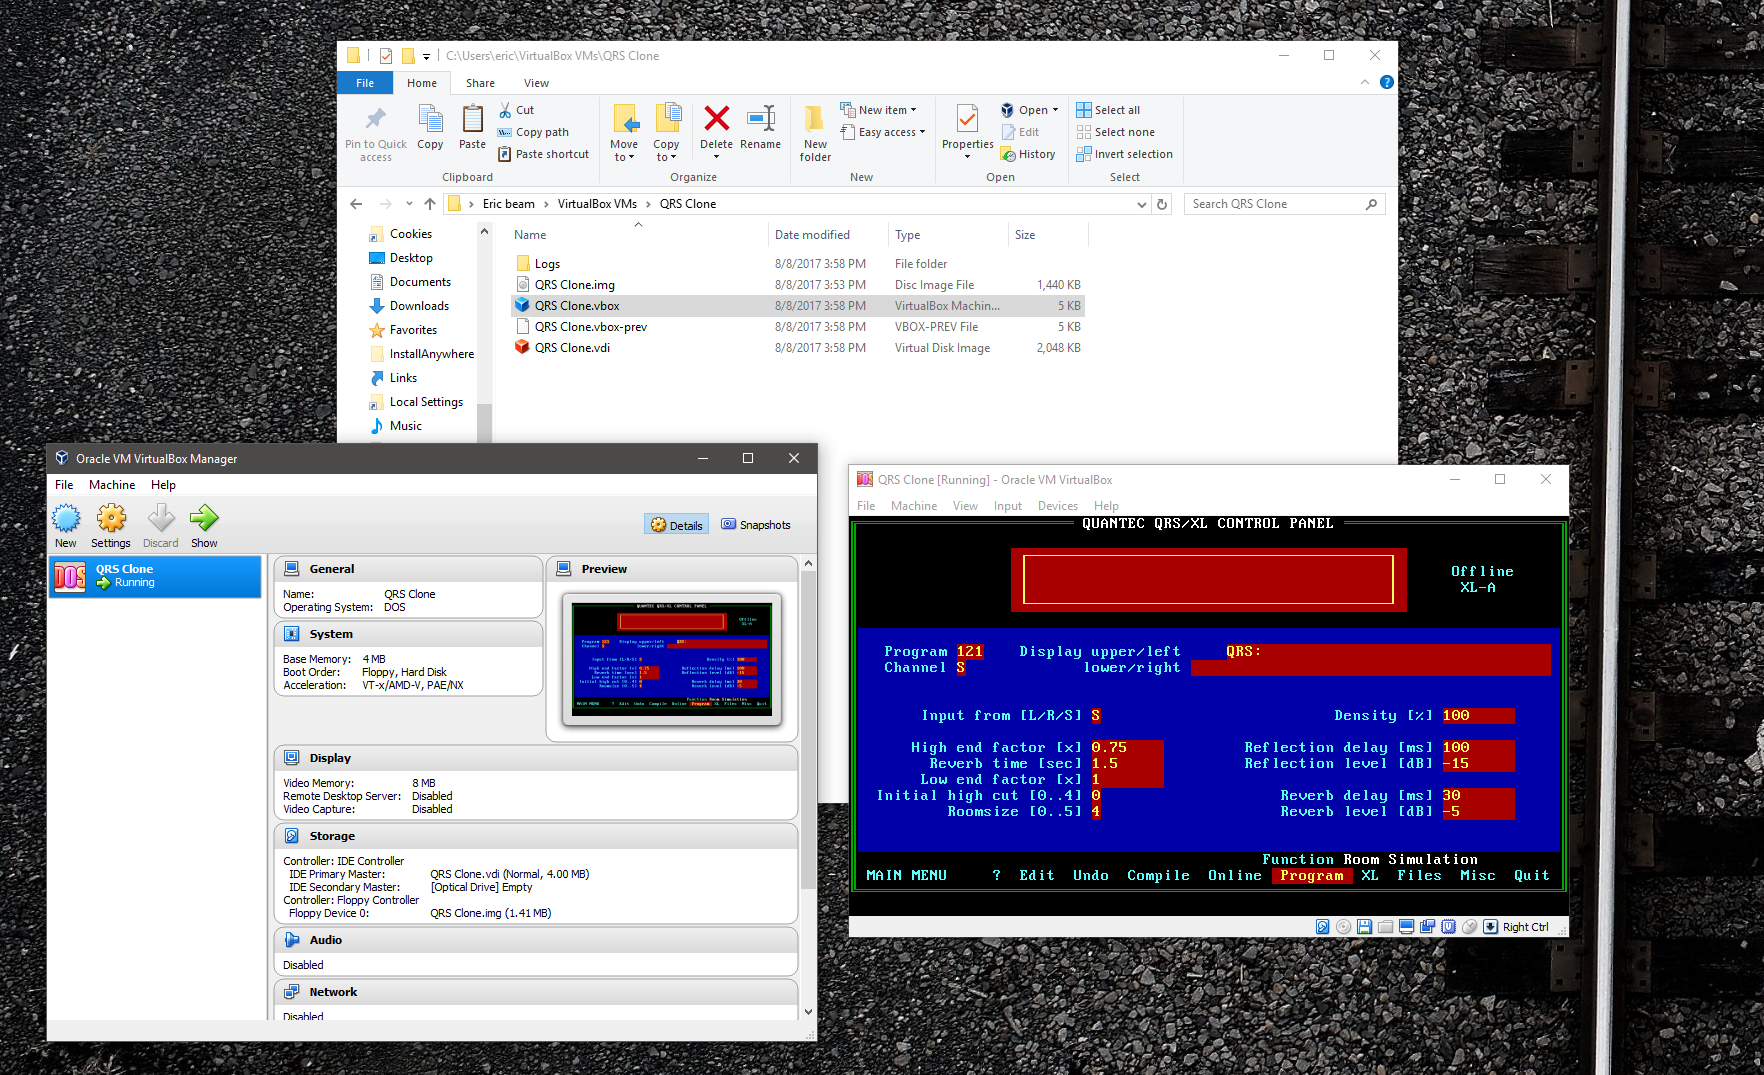 QRS Software control VIA Virtual machine.